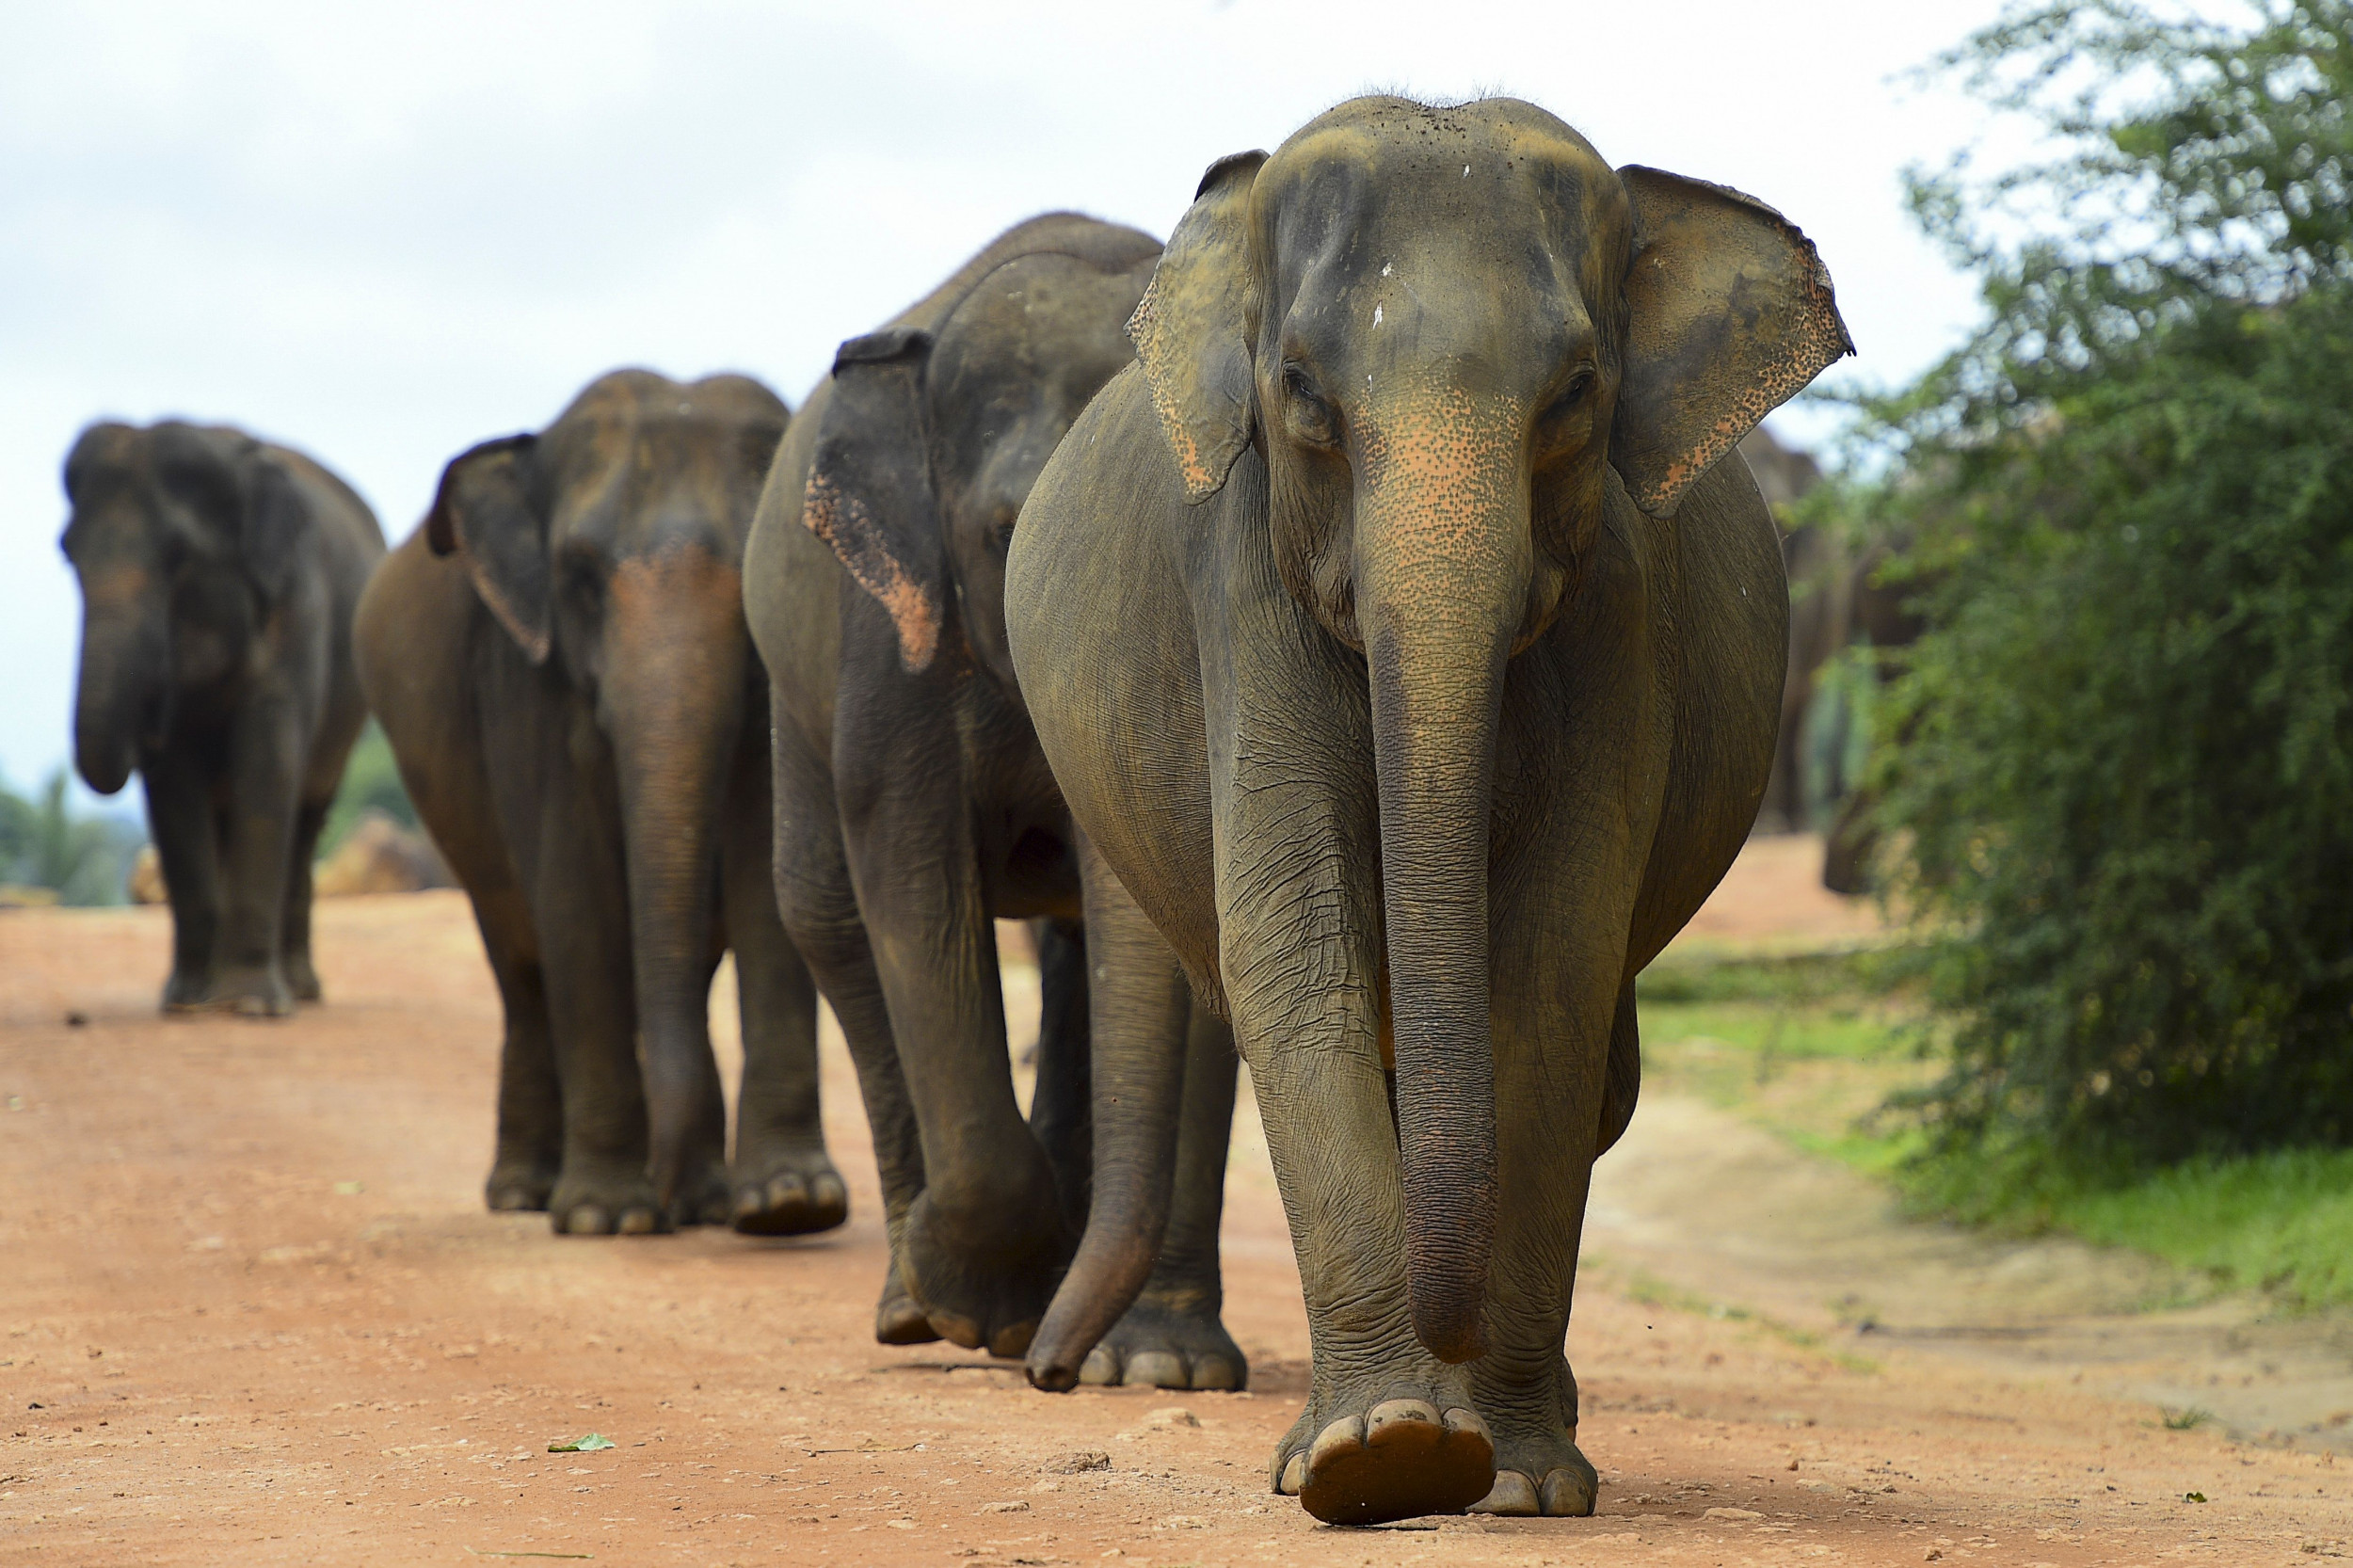 Herd of Elephants Seen Making Cross-Country Journey